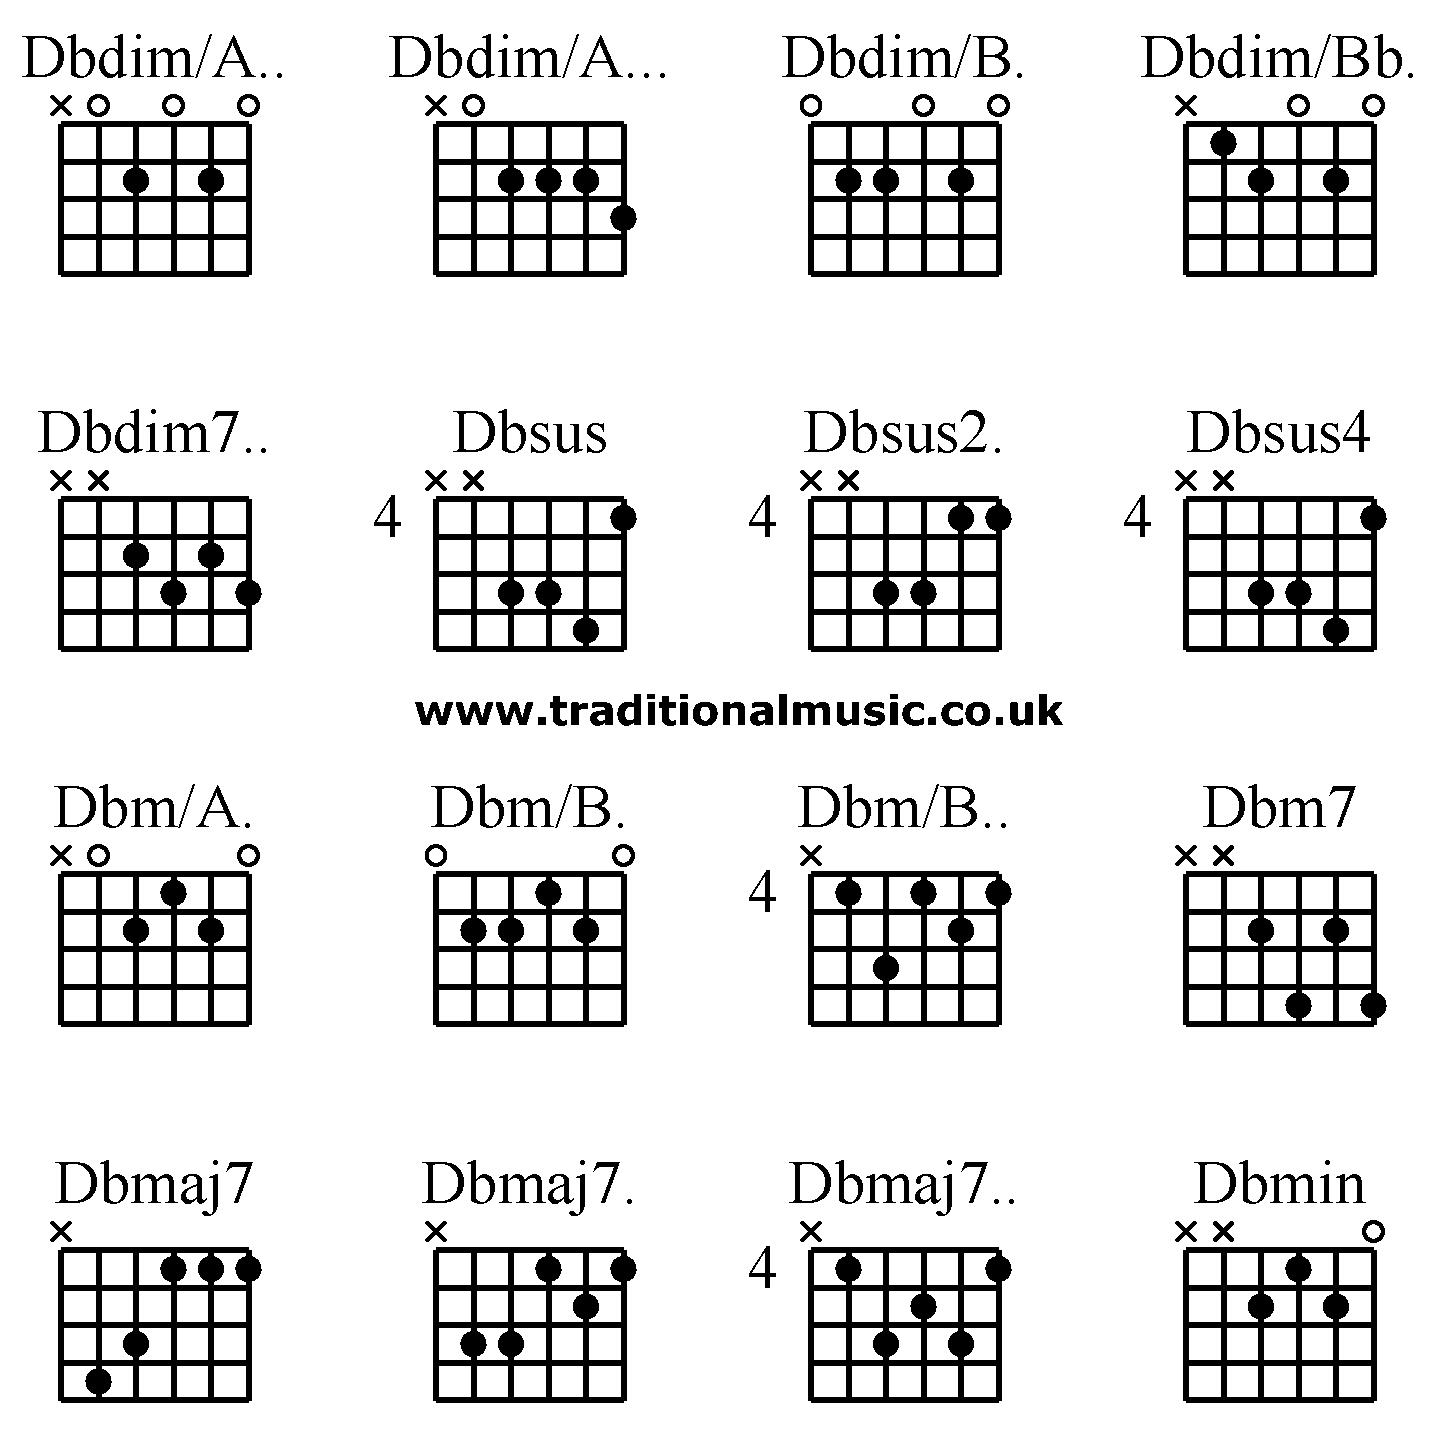 Advanced Guitar Chords Dbdim A Dbdim A Dbdim B Dbdim